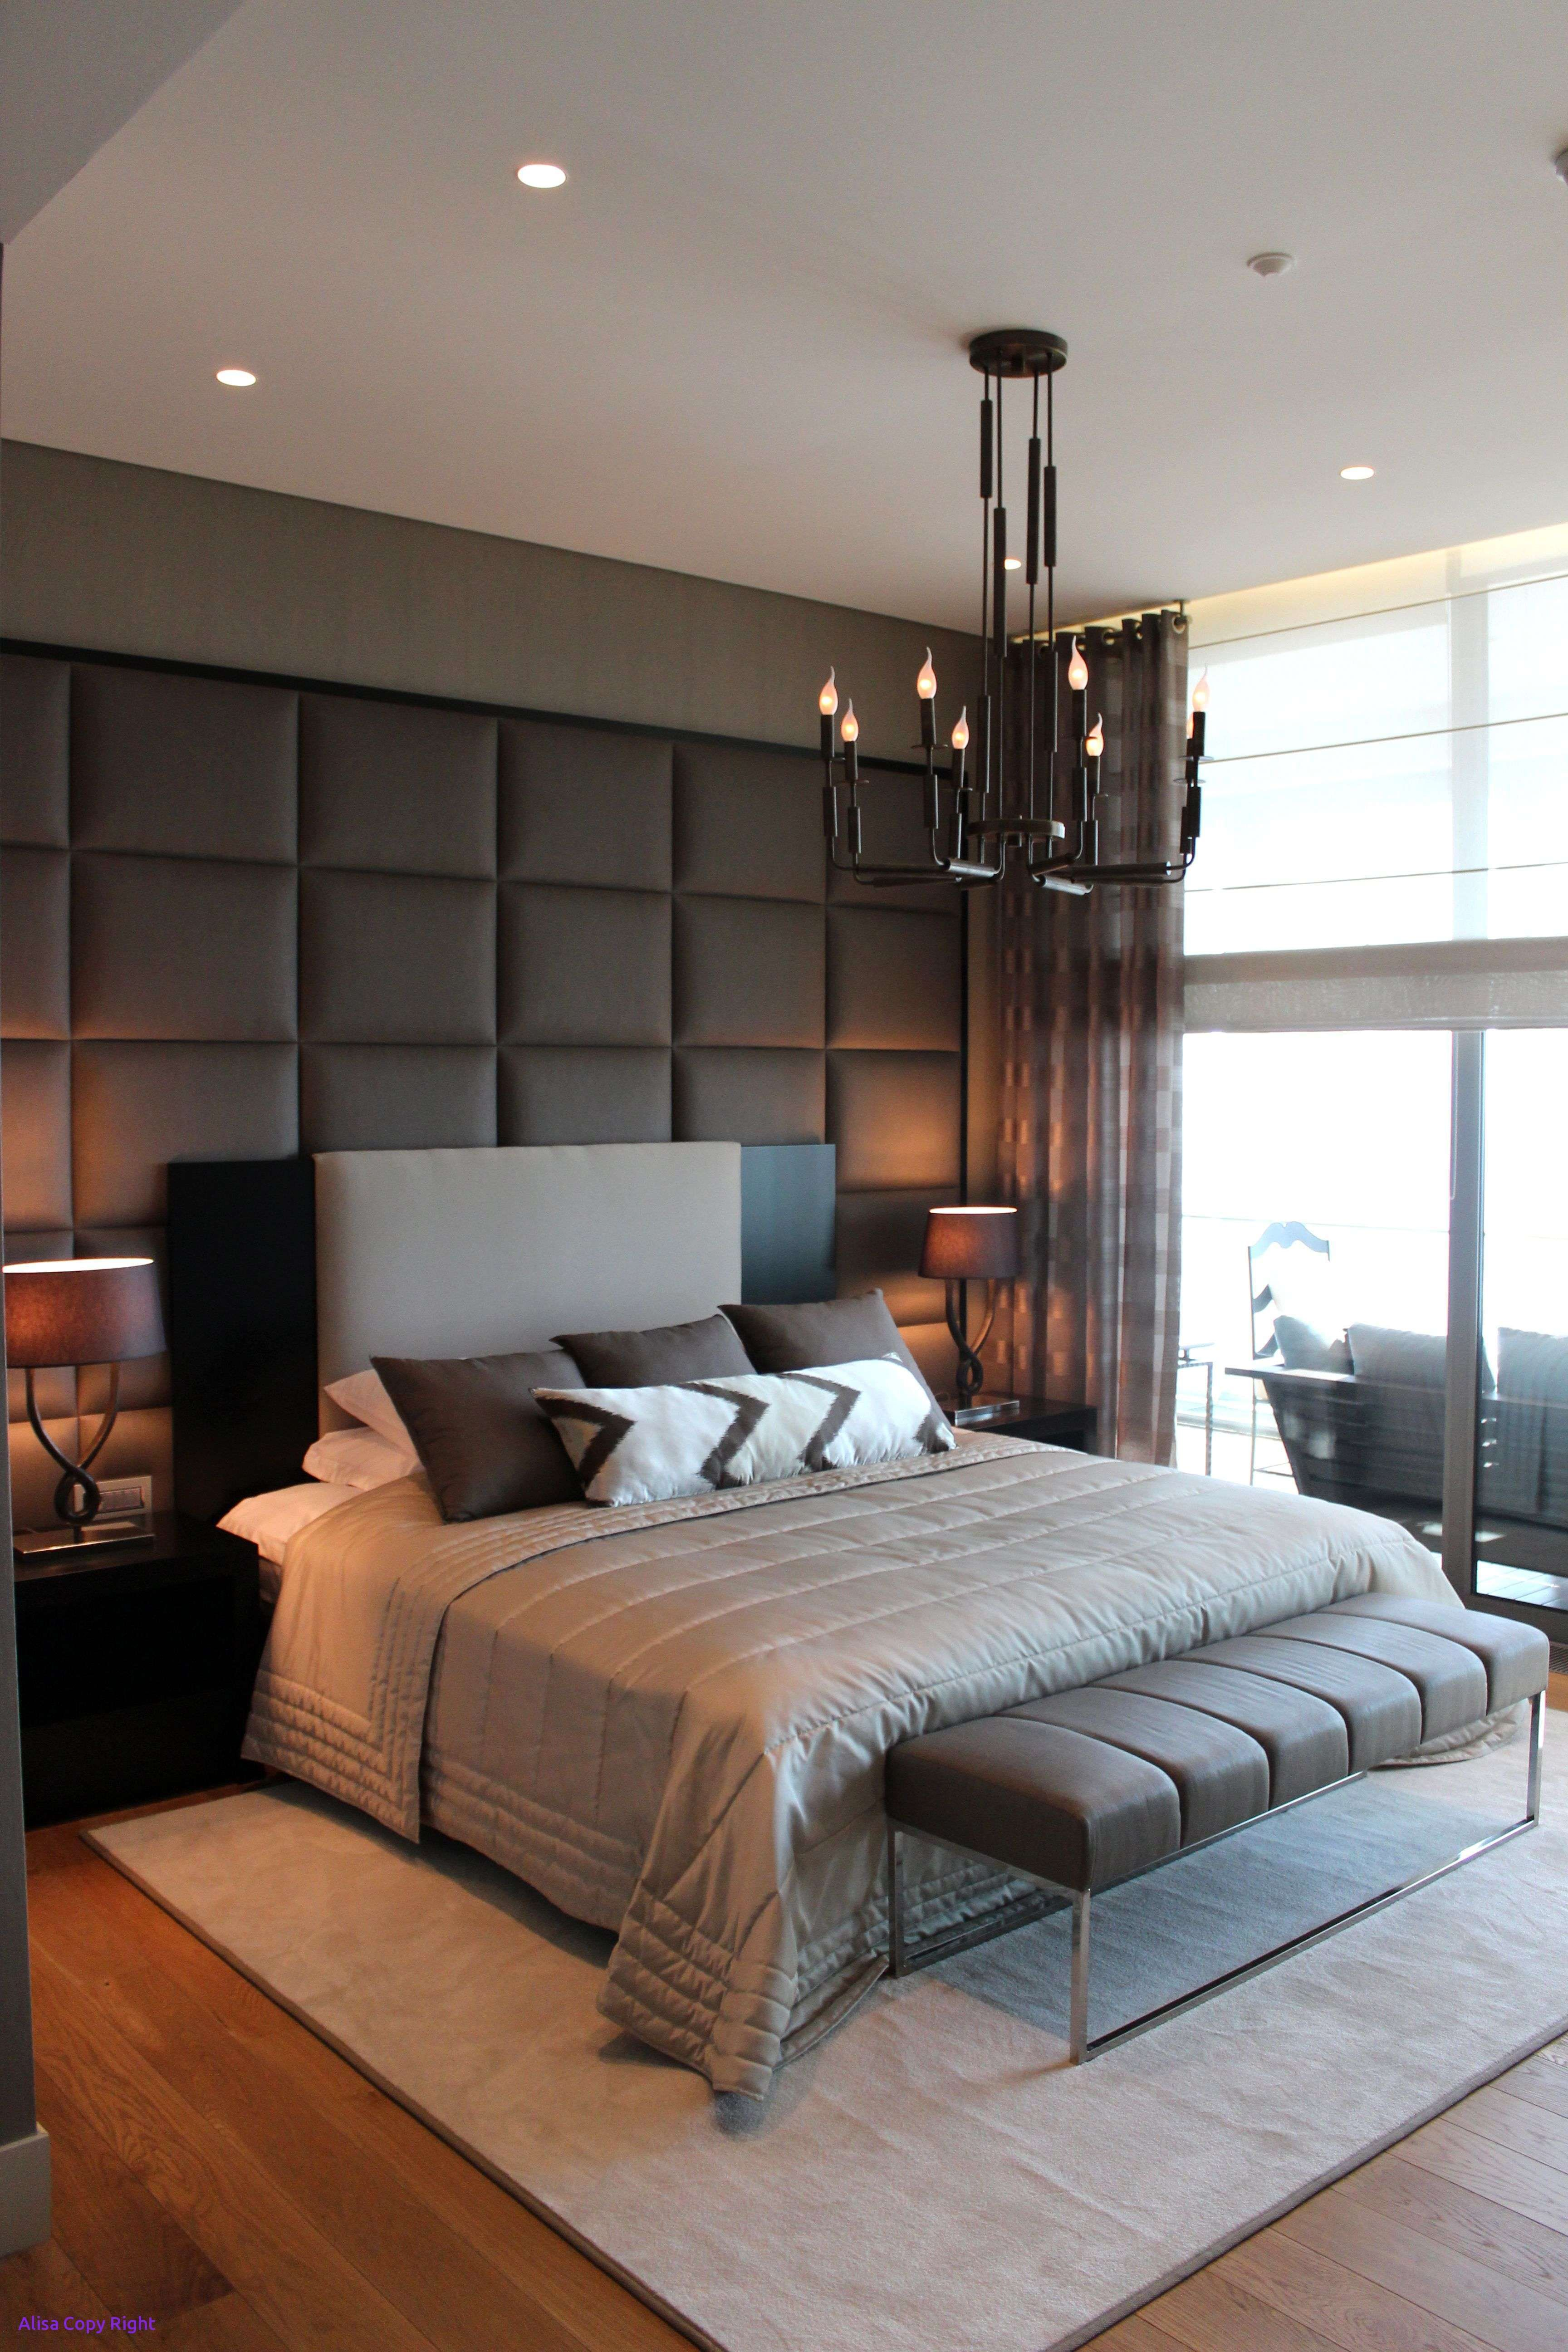 Men Bedroom Homedecoration Homedecorations Homedecorationideas Homedecorationtrends Hom Luxury Bedroom Master Contemporary Bedroom Small Modern Bedroom